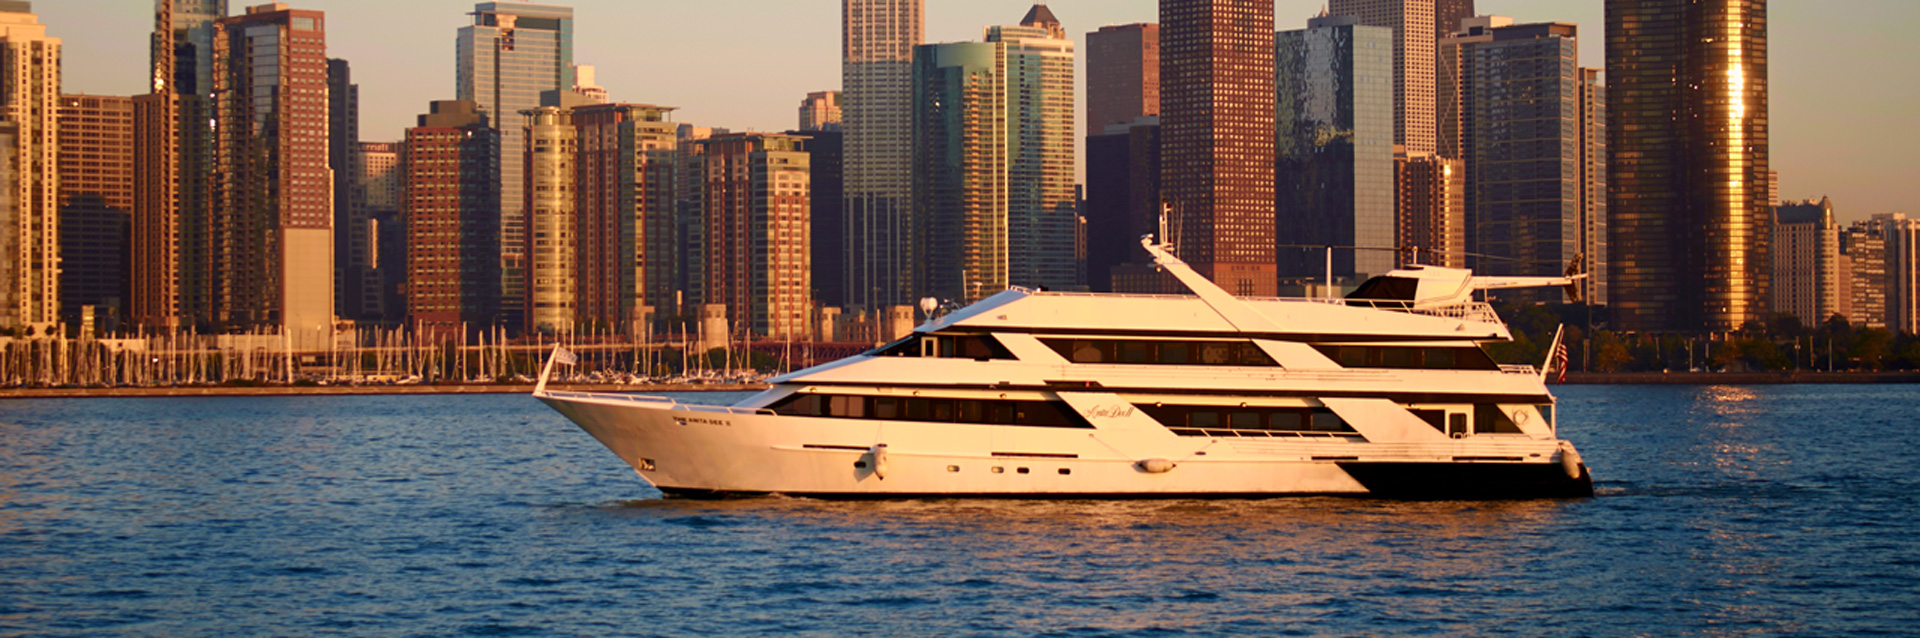 Anita Dee II Photo Gallery | Anita Dee Yacht Charters